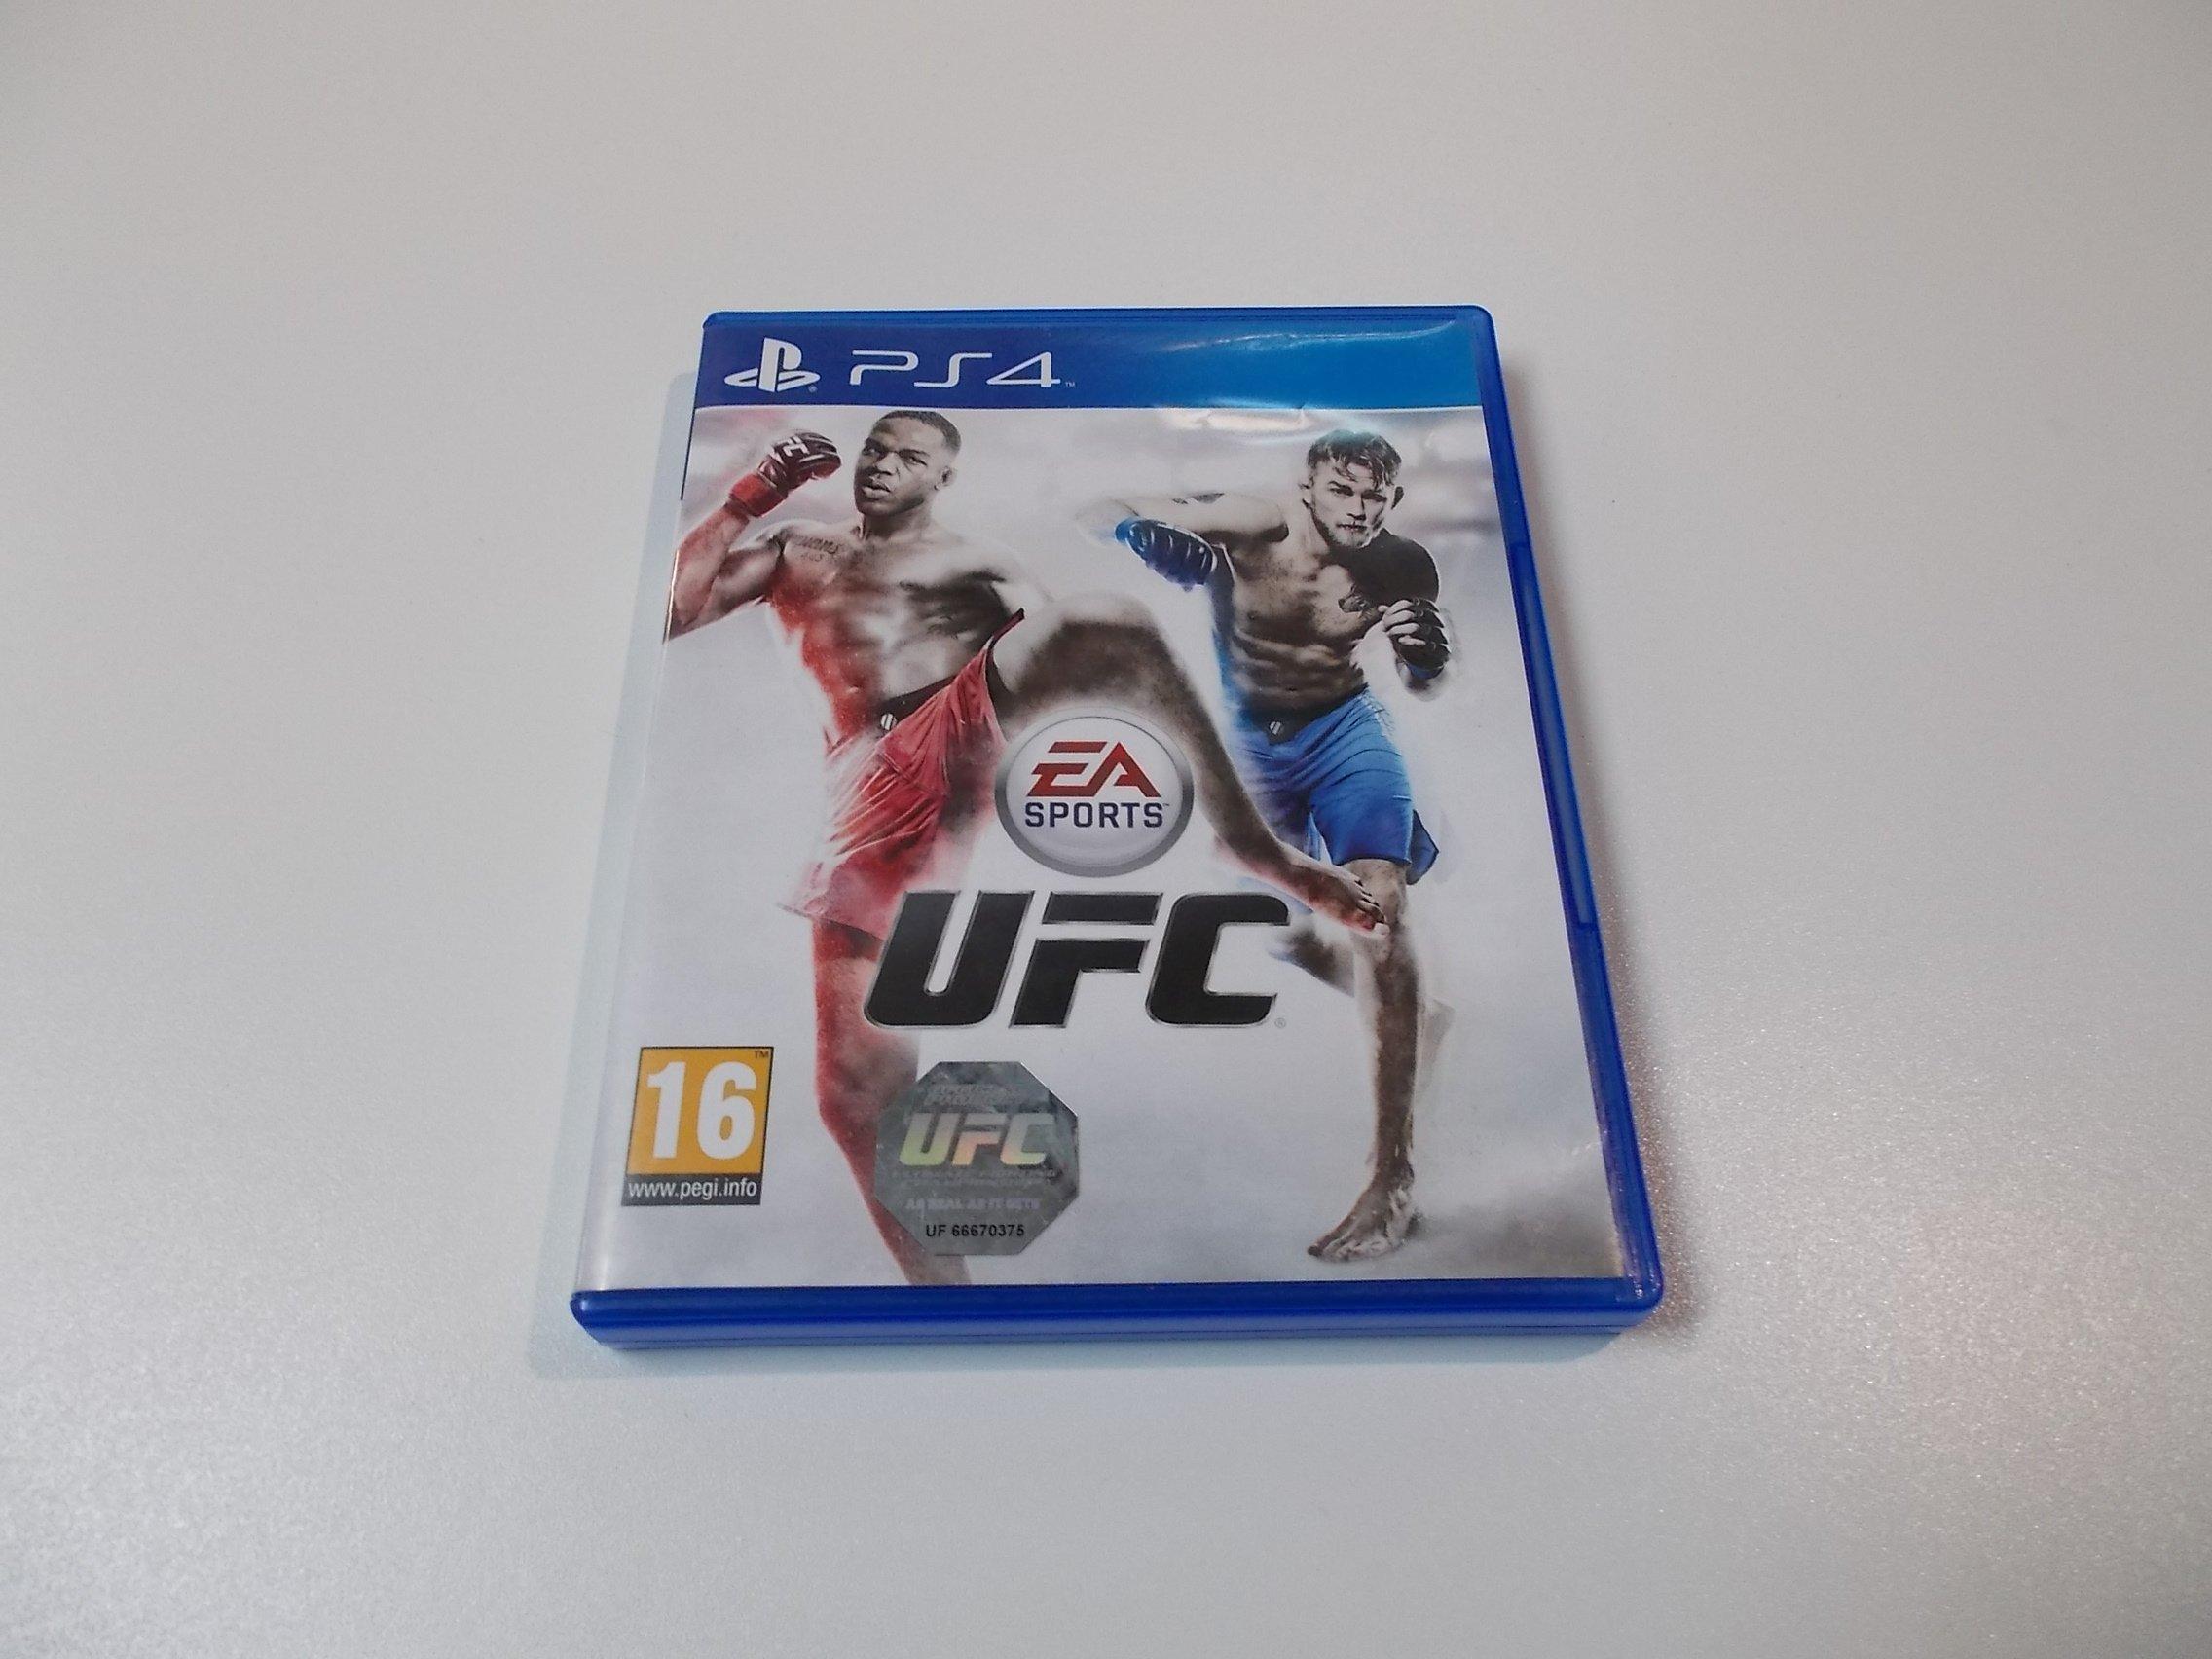 UFC EA SPORTS - GRA Ps4 - Sklep